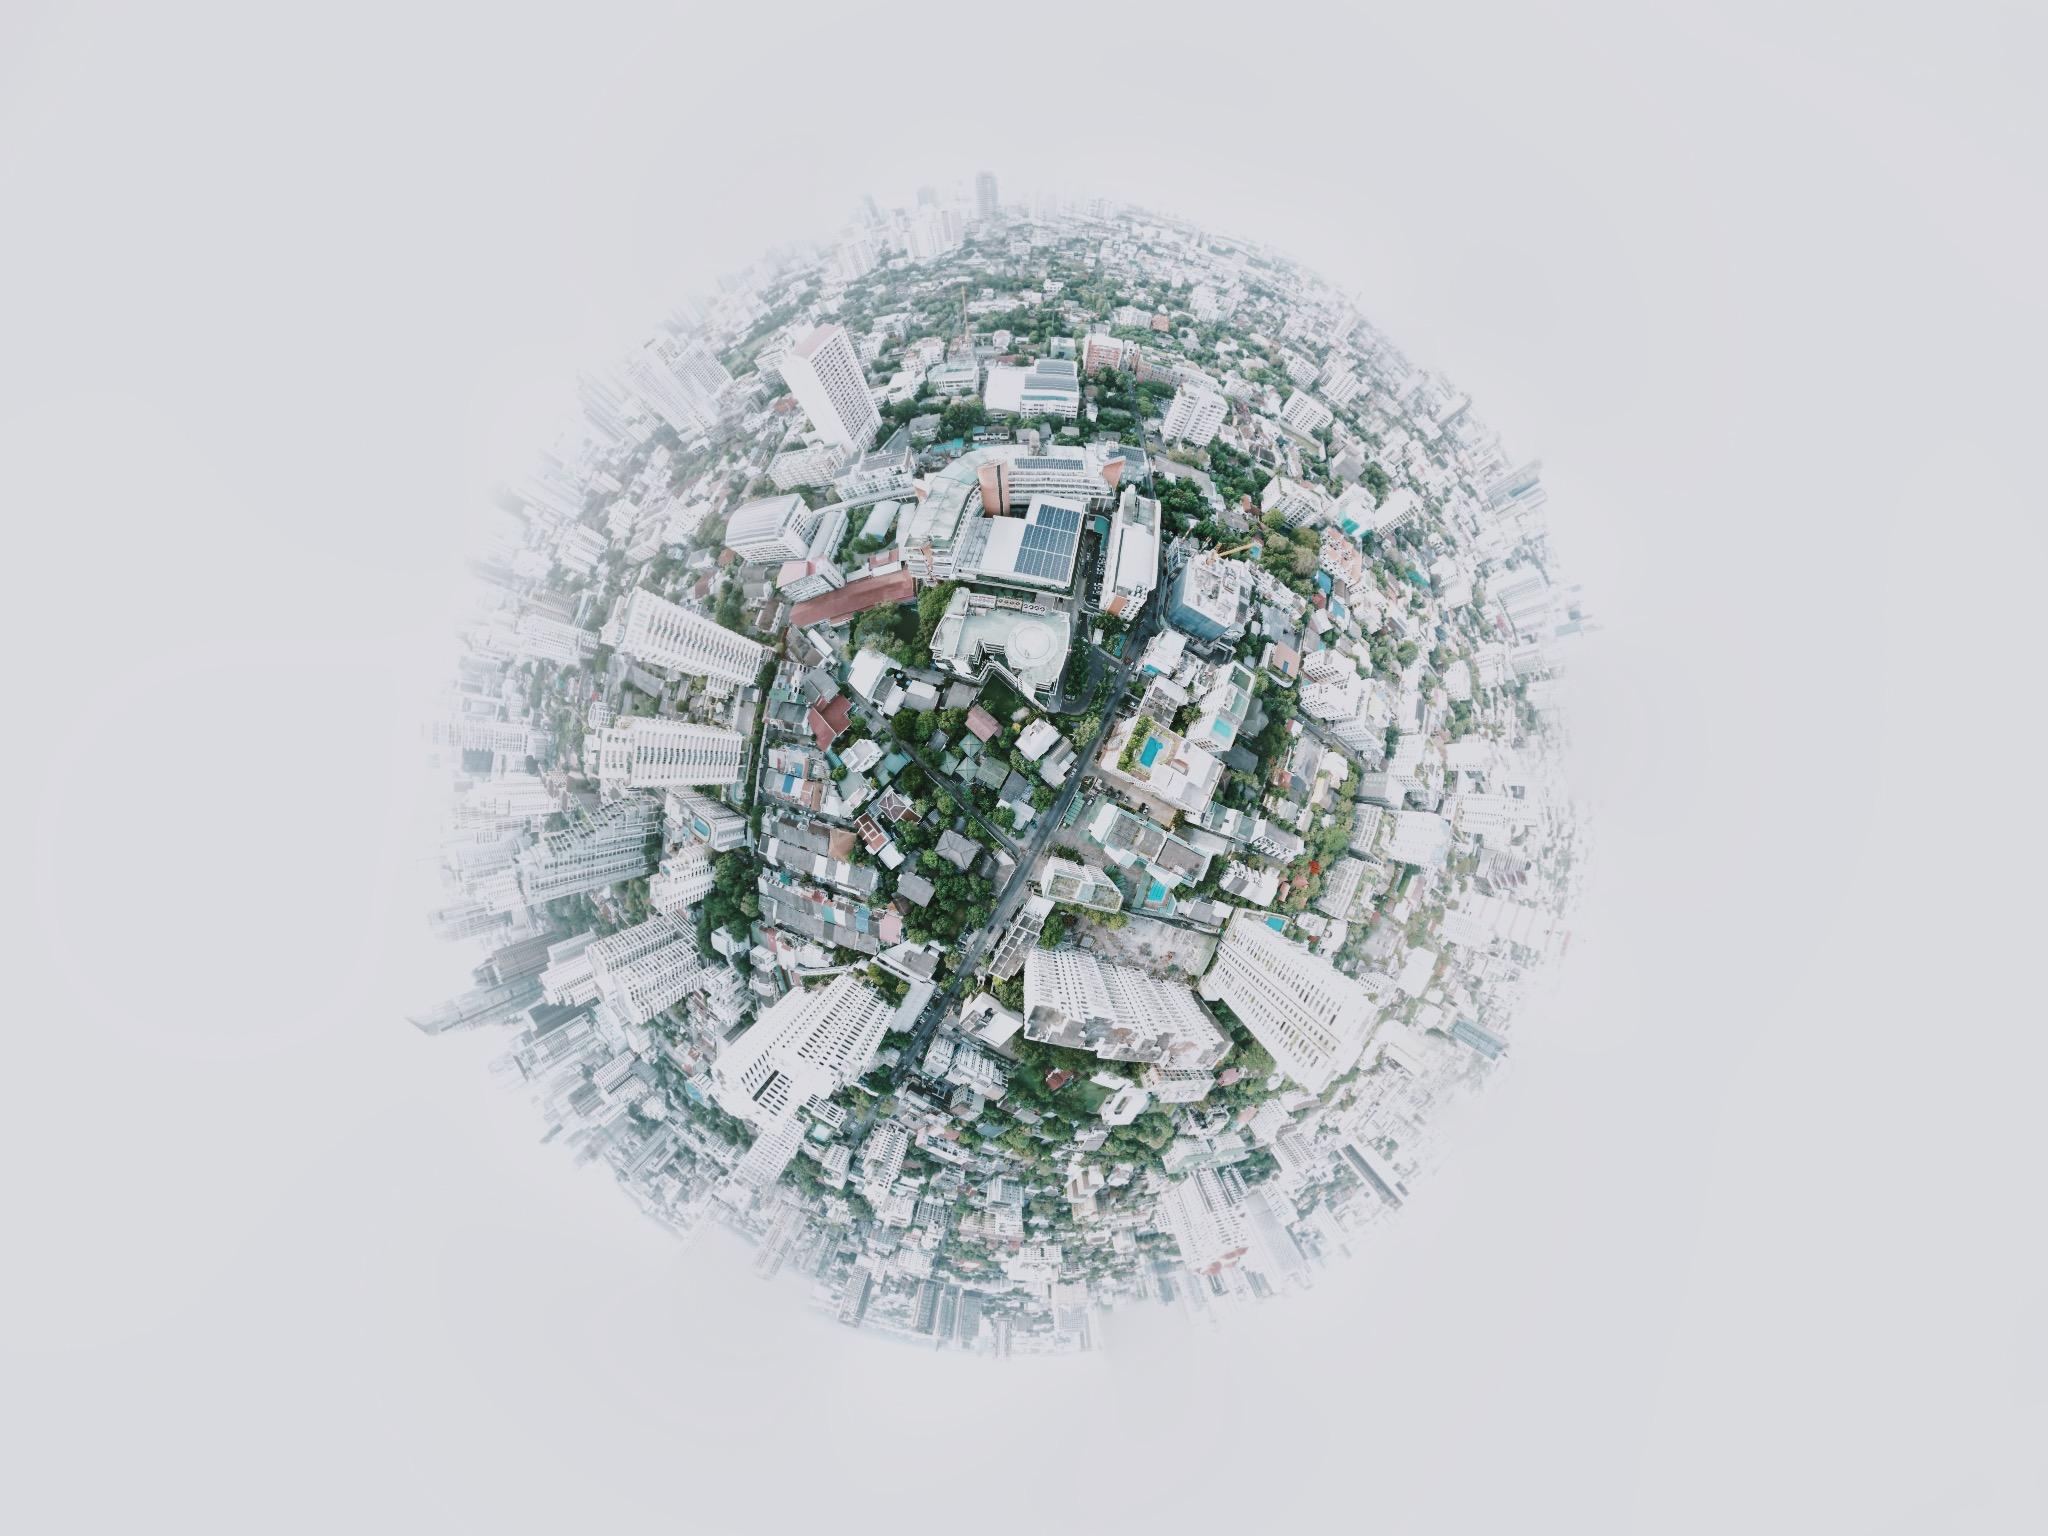 Community-driven data shapes infrastructure investment standards - Slum Dwellers International (SDI) and Global Infrastructure Basel (GIB) Foundation.